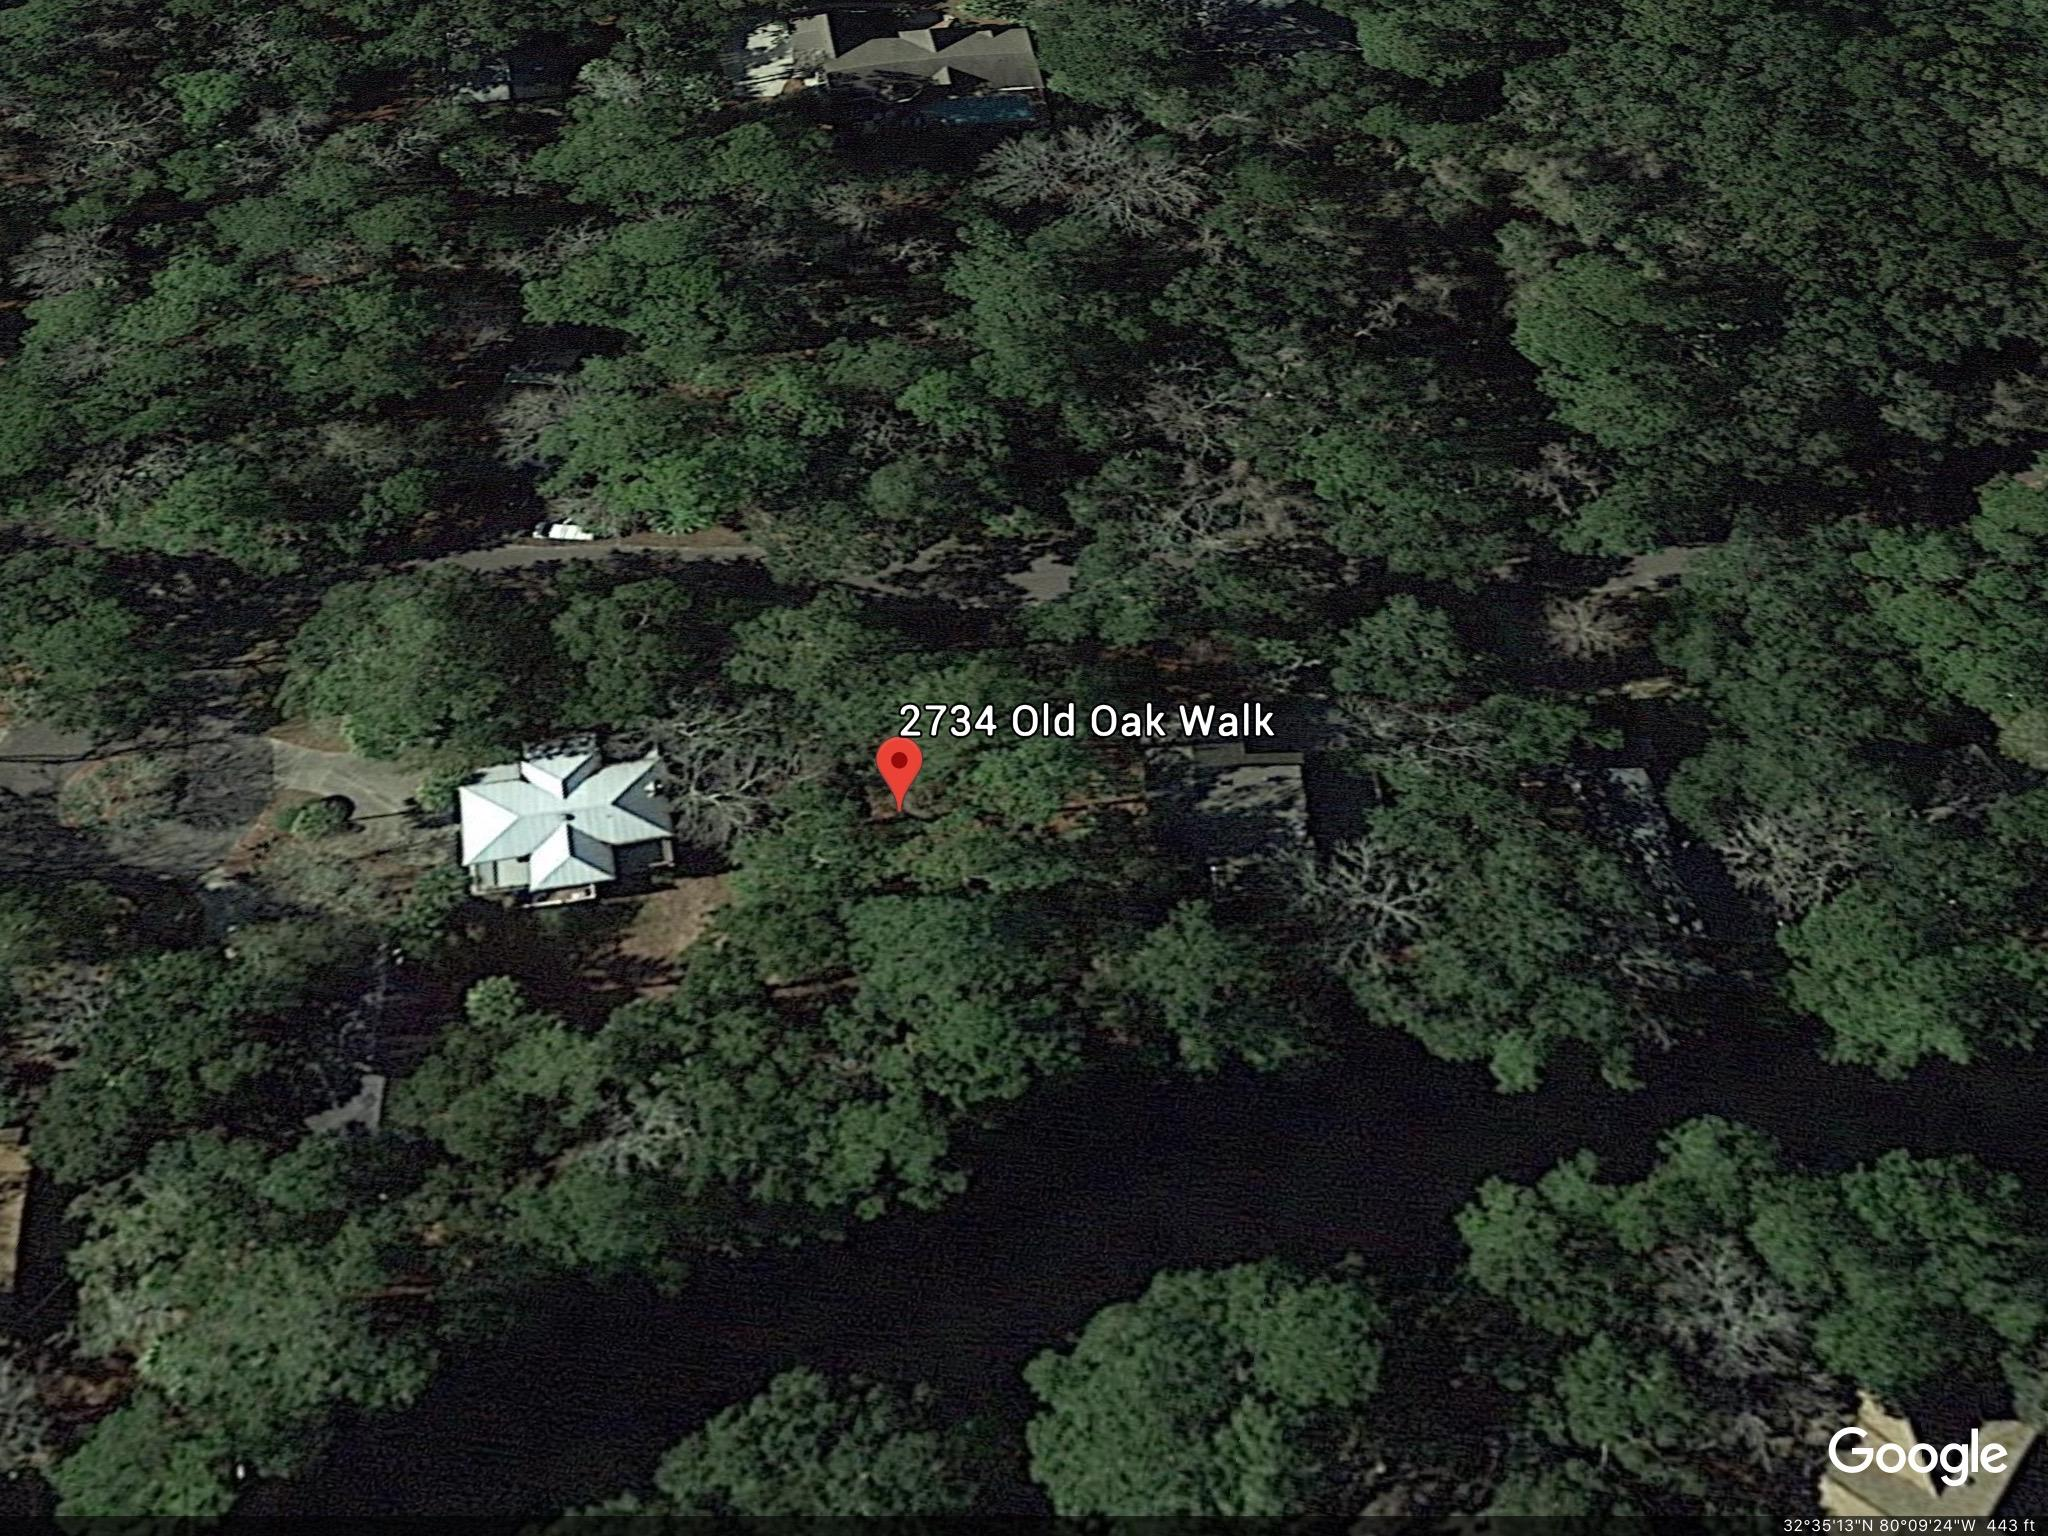 2734 Old Oak Walk Seabrook Island, SC 29455